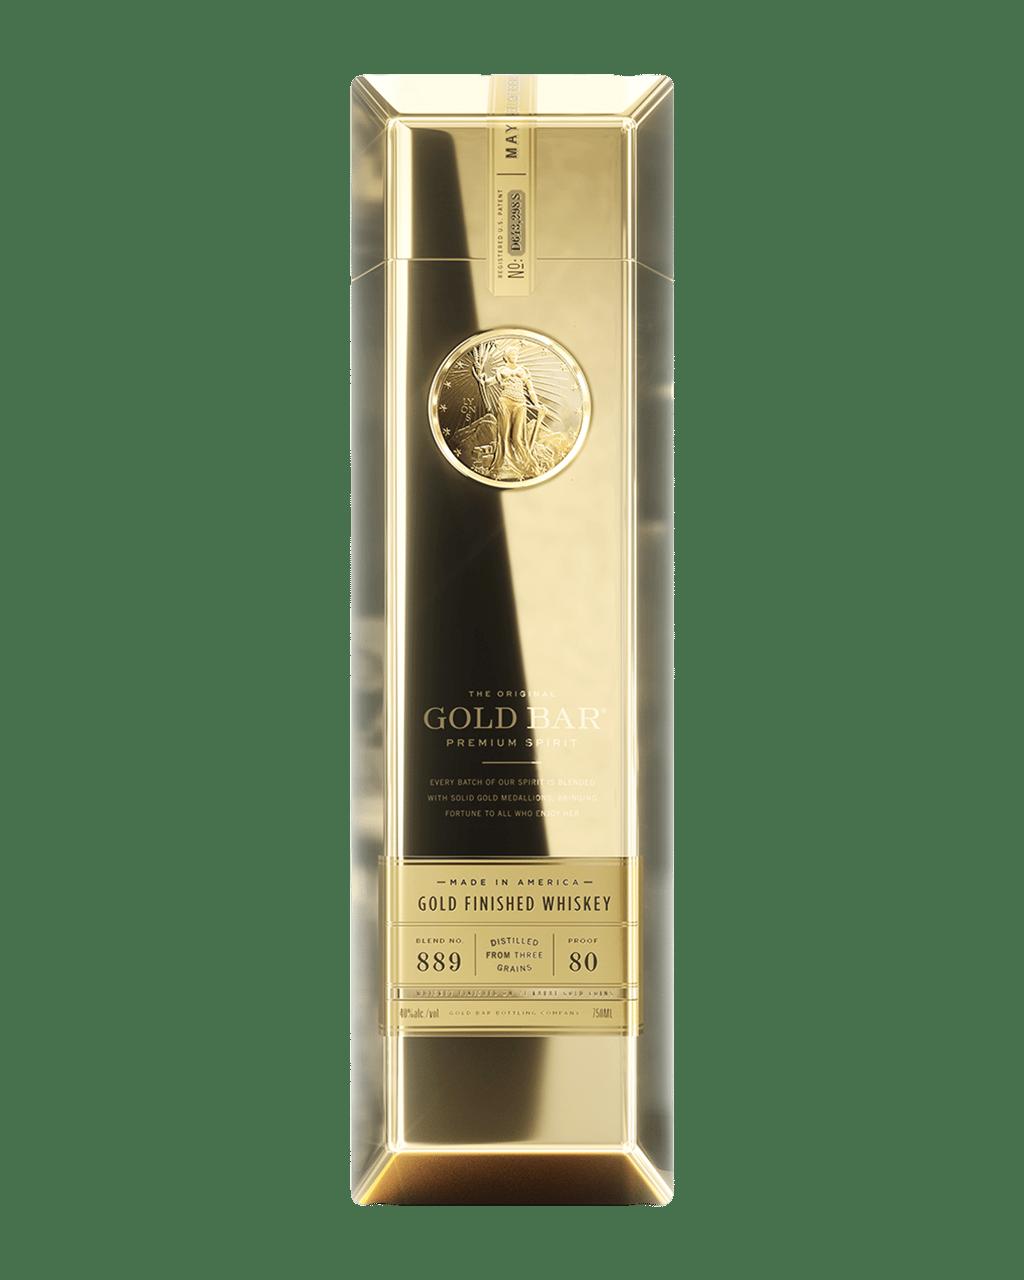 b33d97ef36e42 Gold Bar The Original Gold Bar Gold Finished Premium Spirit